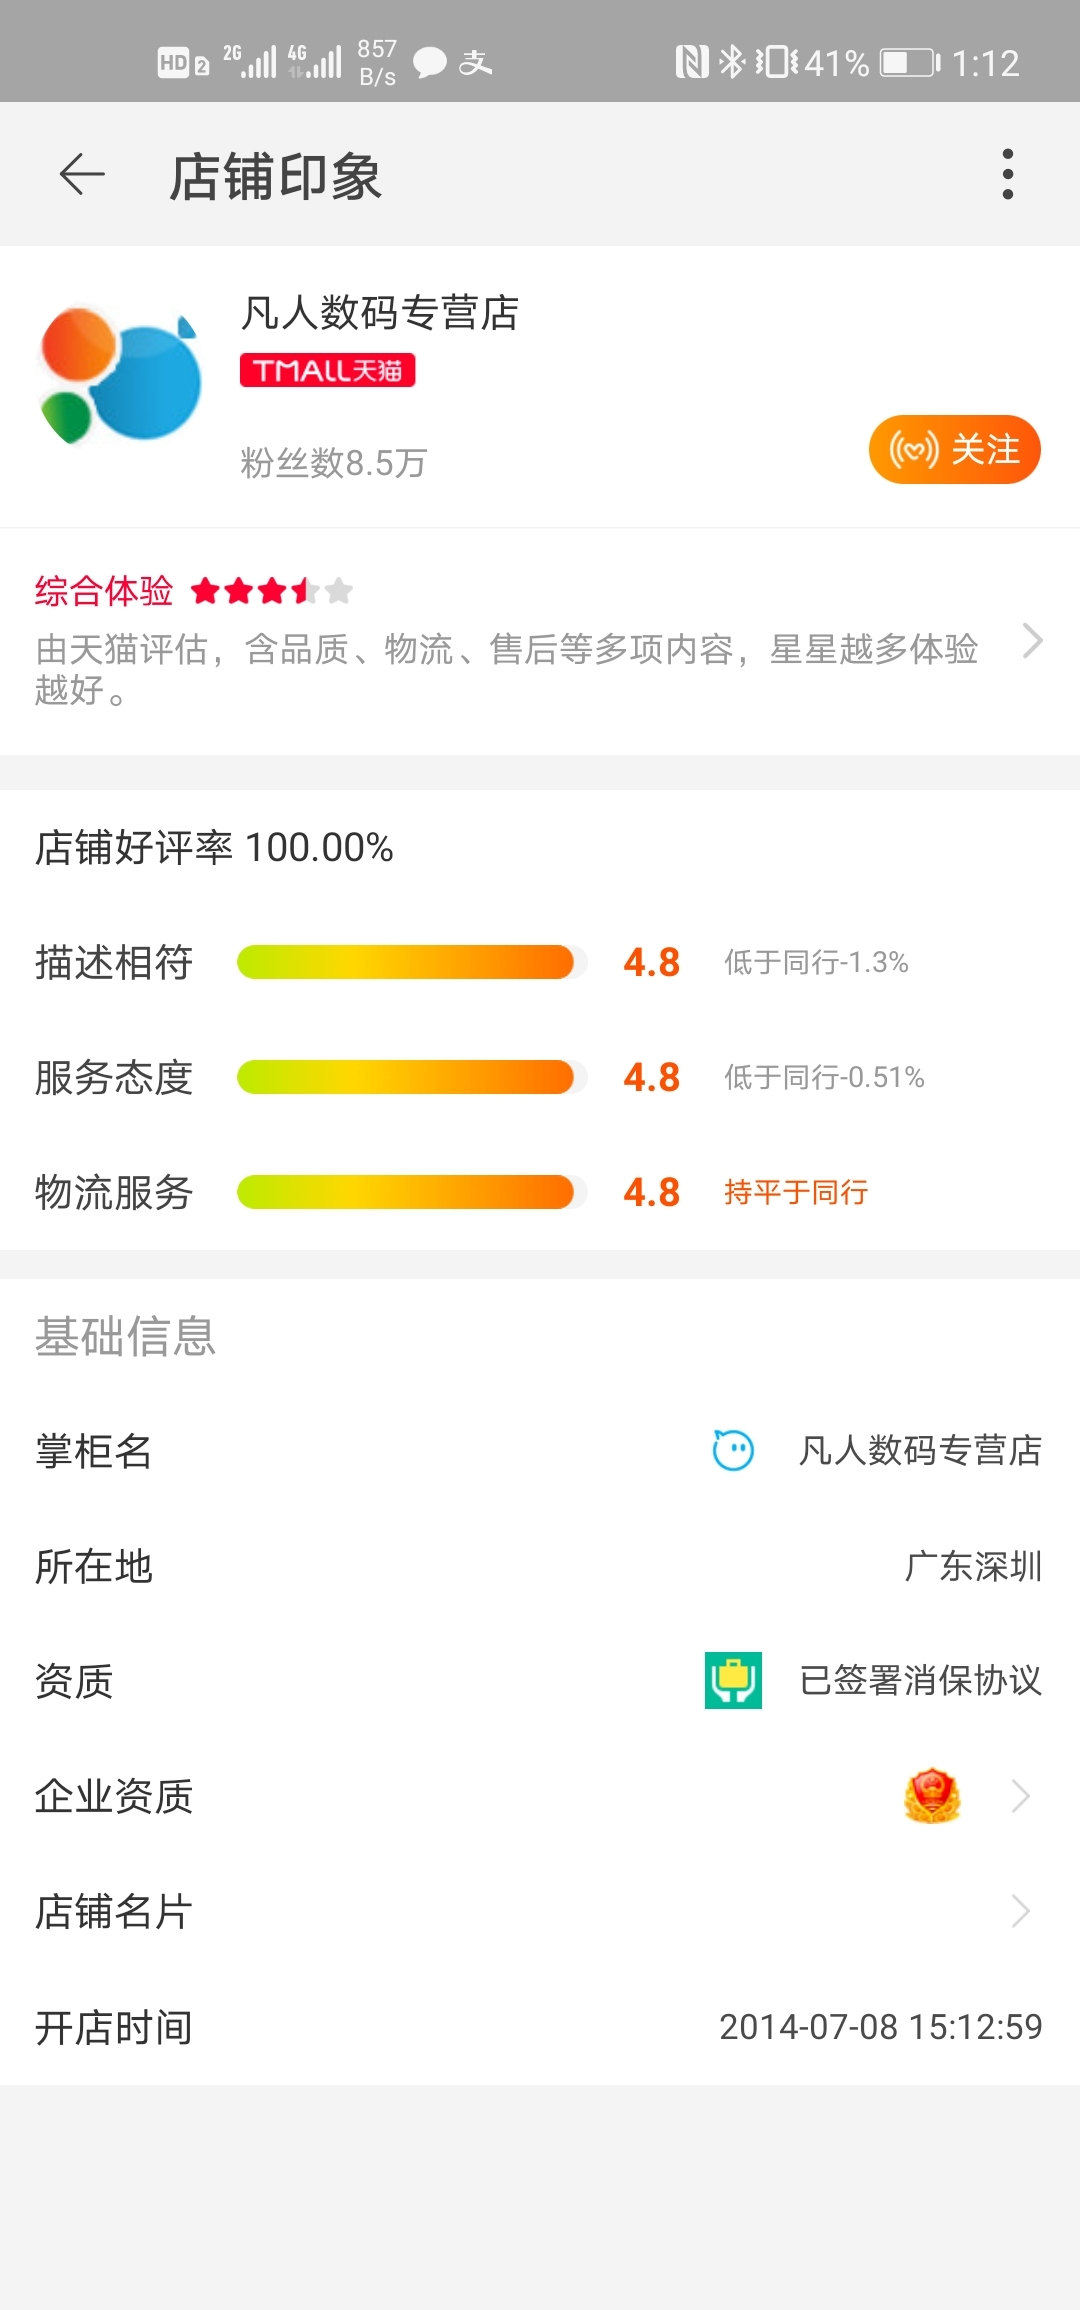 Screenshot_20200509_131255_com.taobao.taobao.jpg